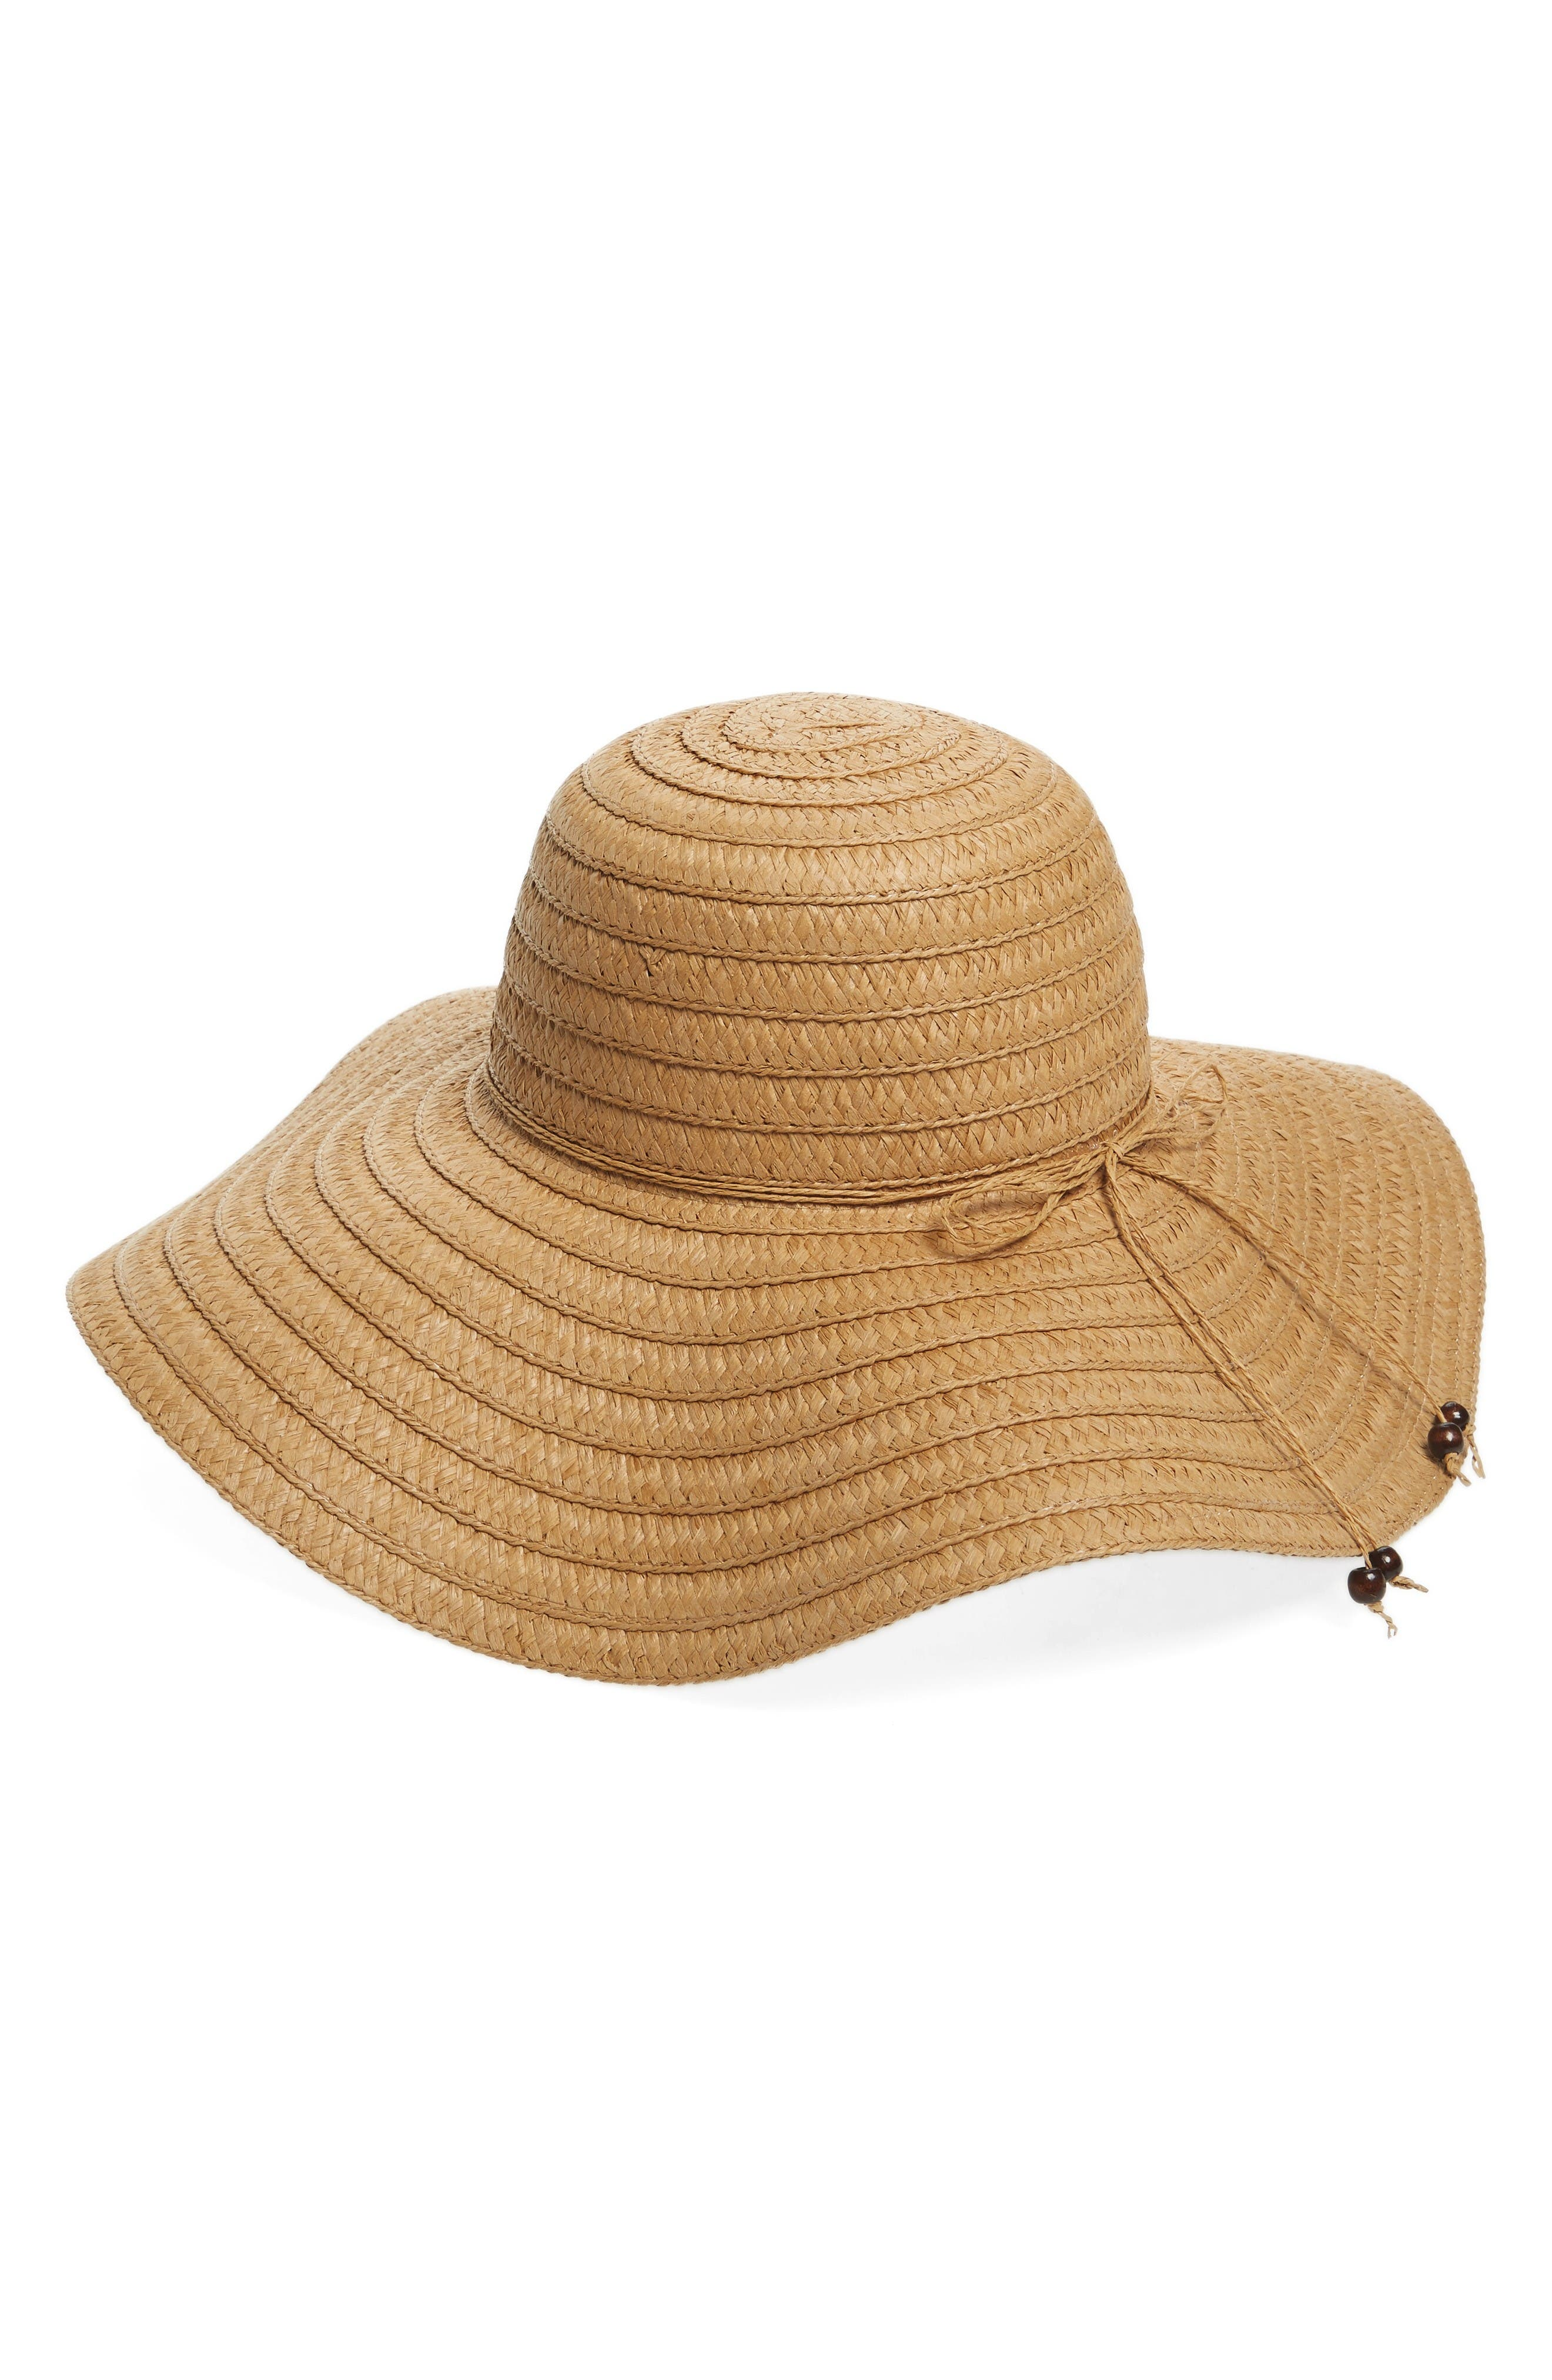 Main Image - Emanuel Geraldo Floppy Straw Hat